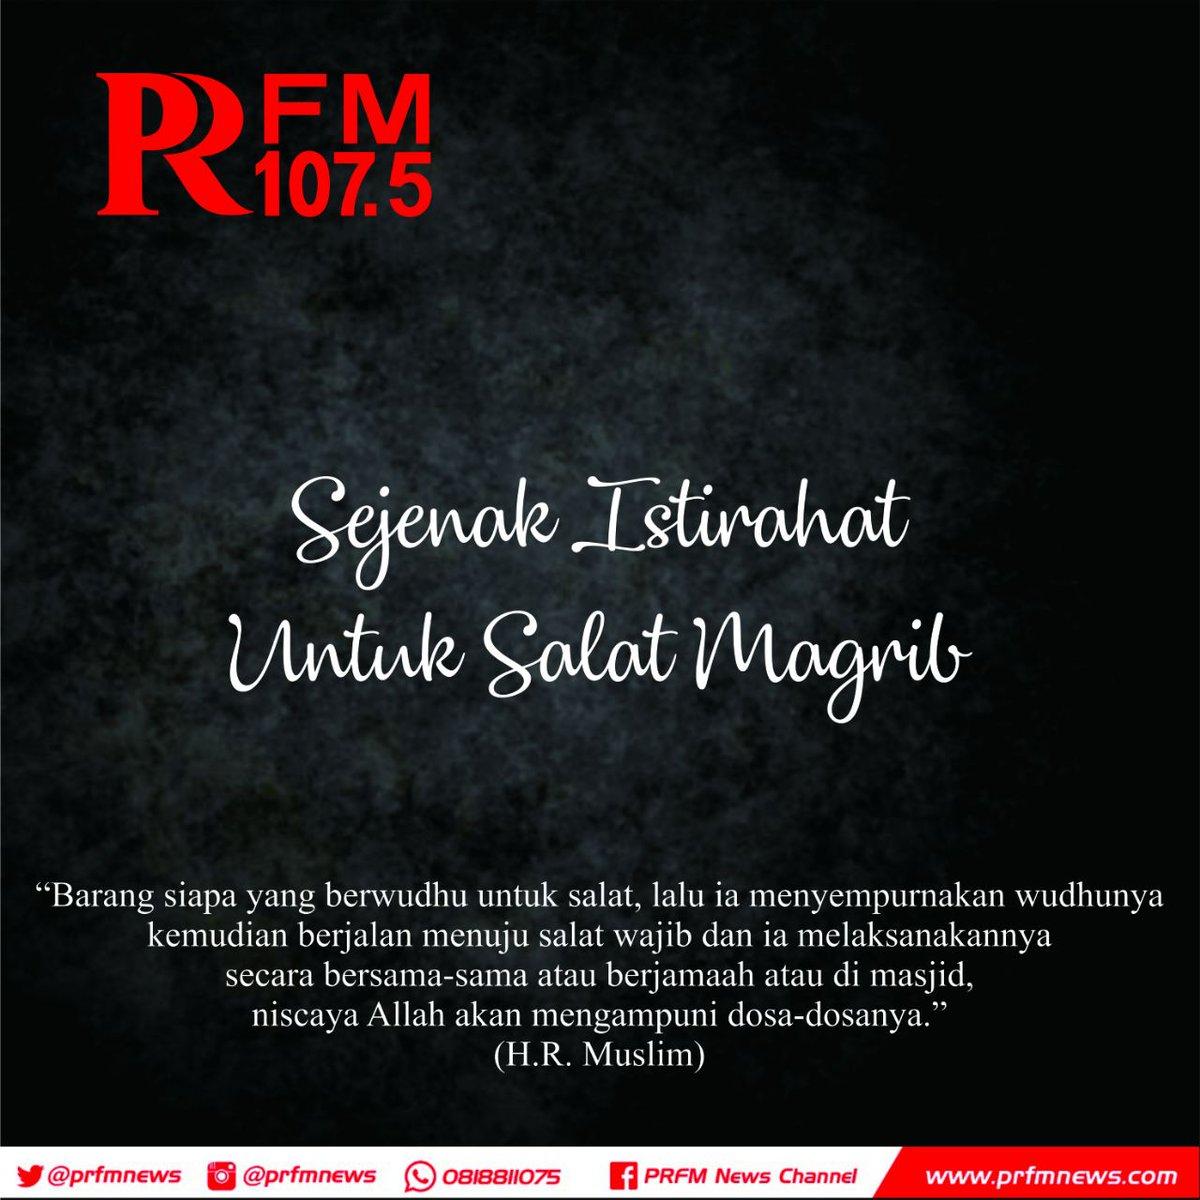 Radio Prfm Bandung Twitter वर Telah Tiba Waktunya Adzan Magrib